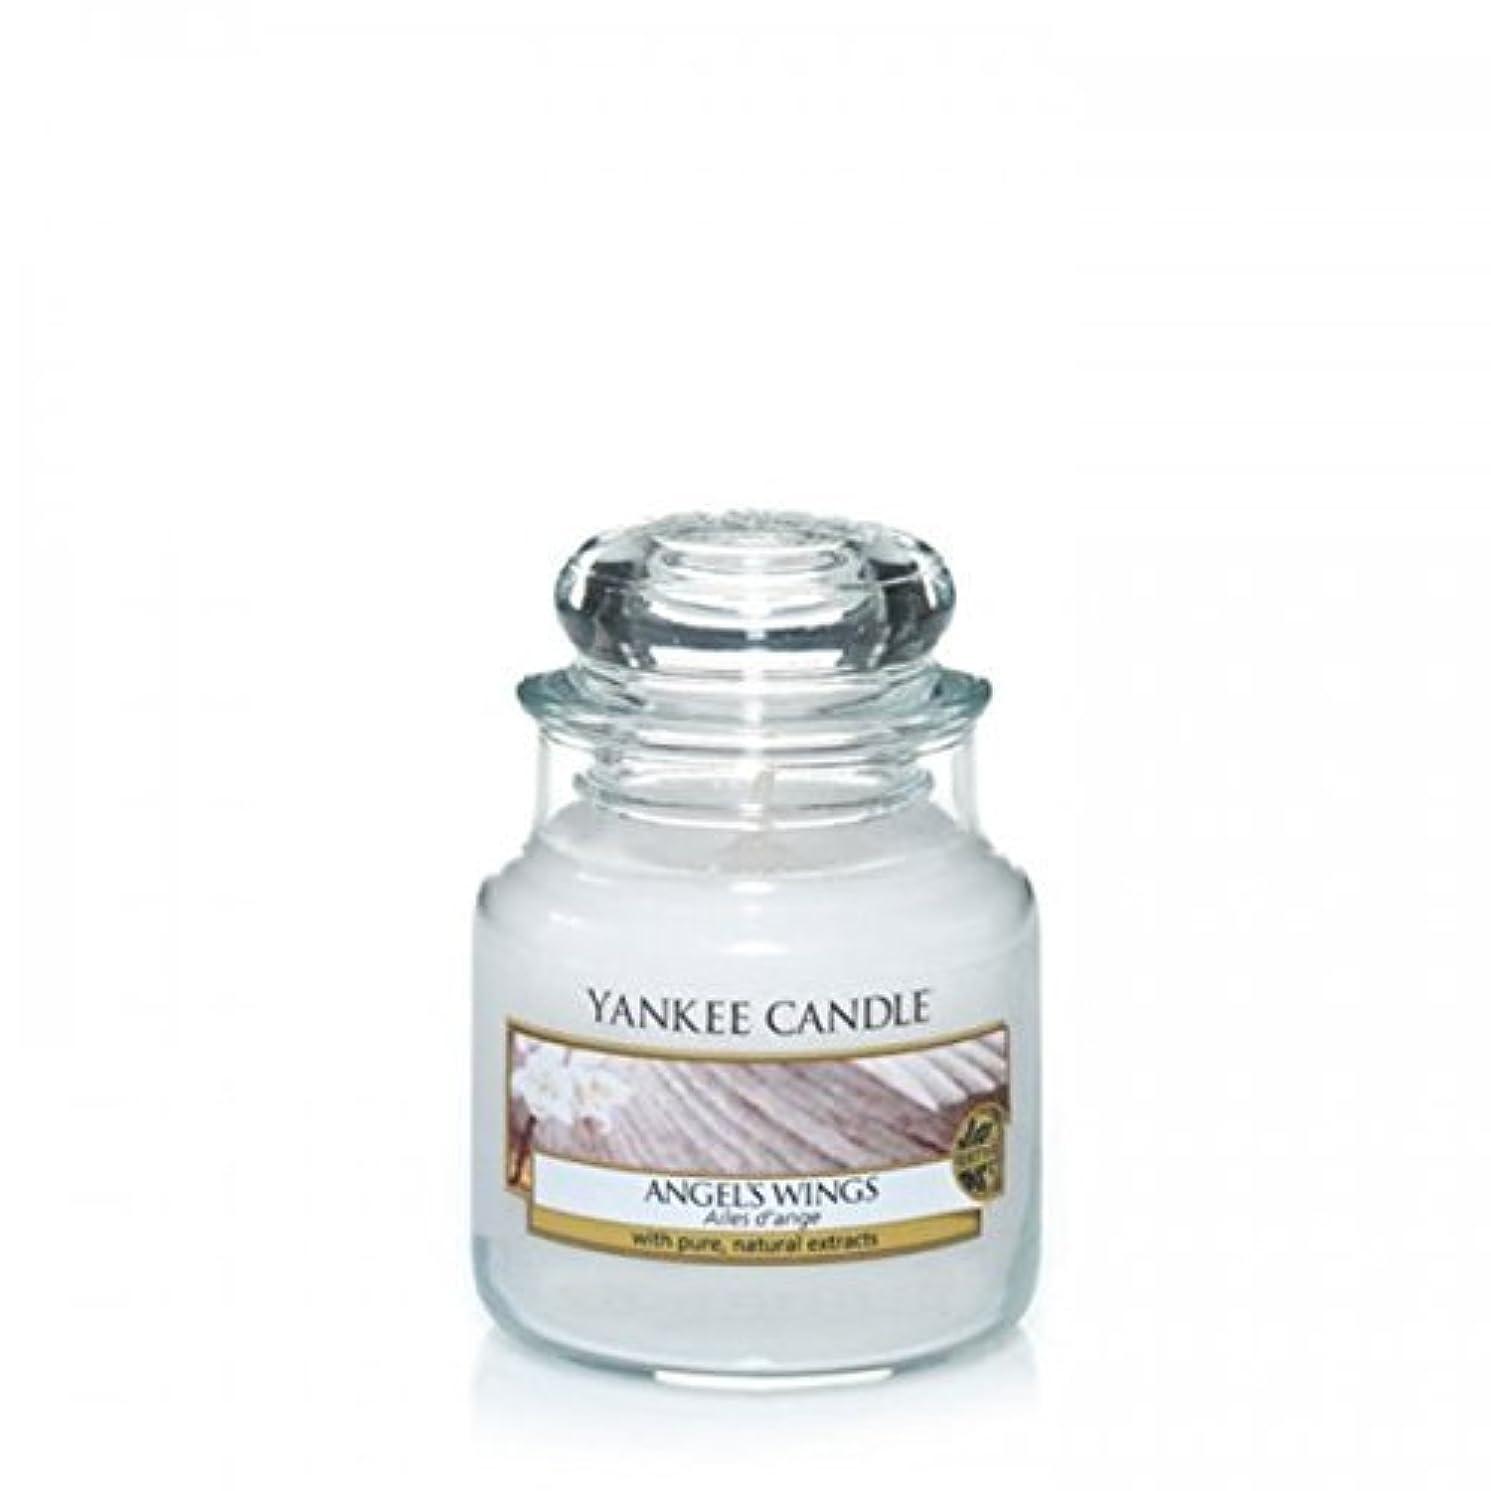 消防士報奨金六月Yankee Candle Angels Wings Jar 3.7Oz by Yankee Candle [並行輸入品]